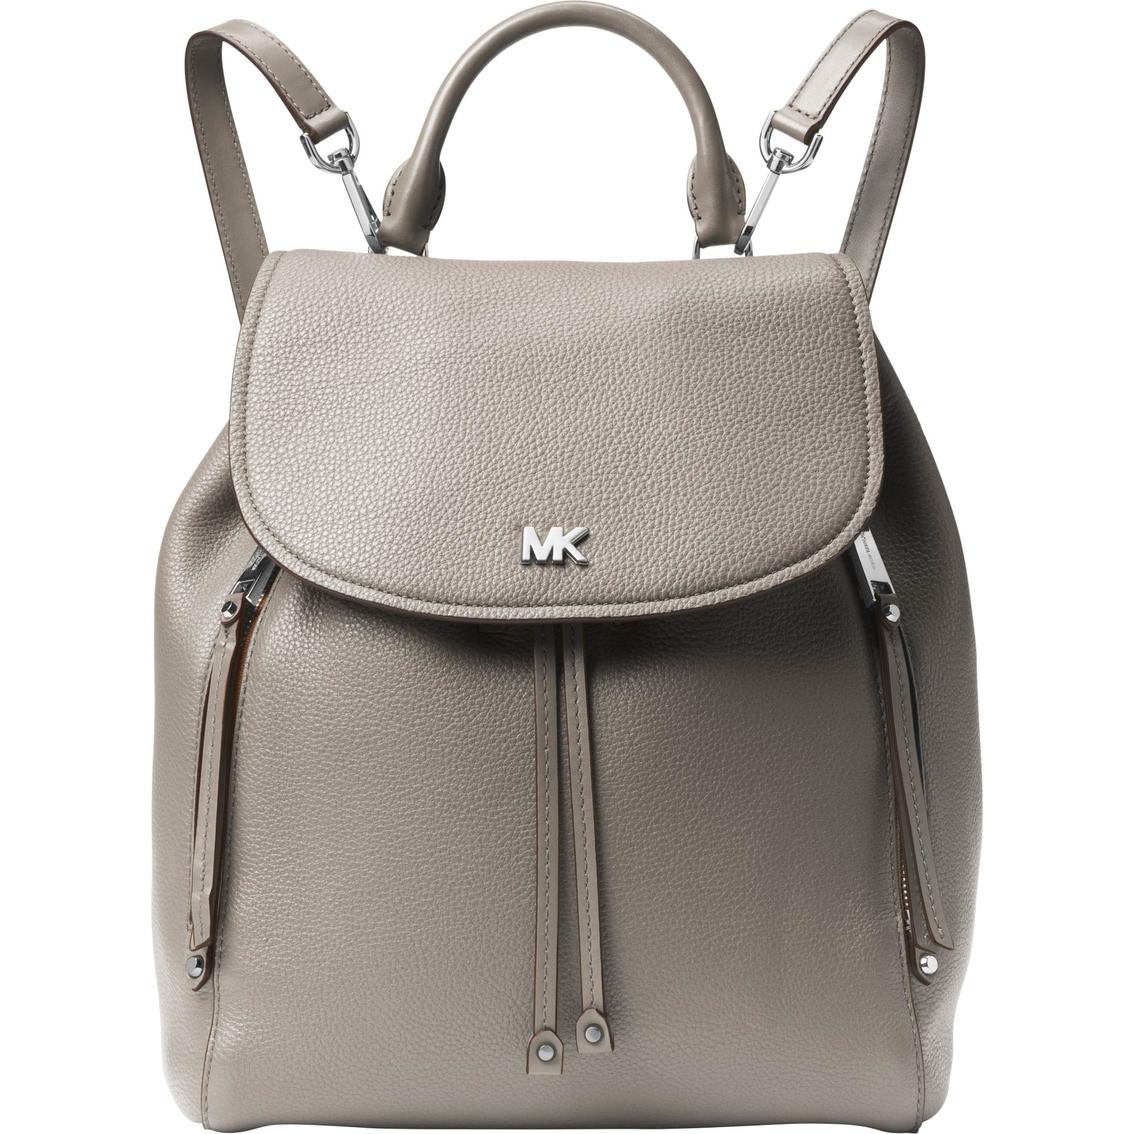 72538eb19d20 Michael Kors Evie Backpack Leather | Handbags | Shop The Exchange